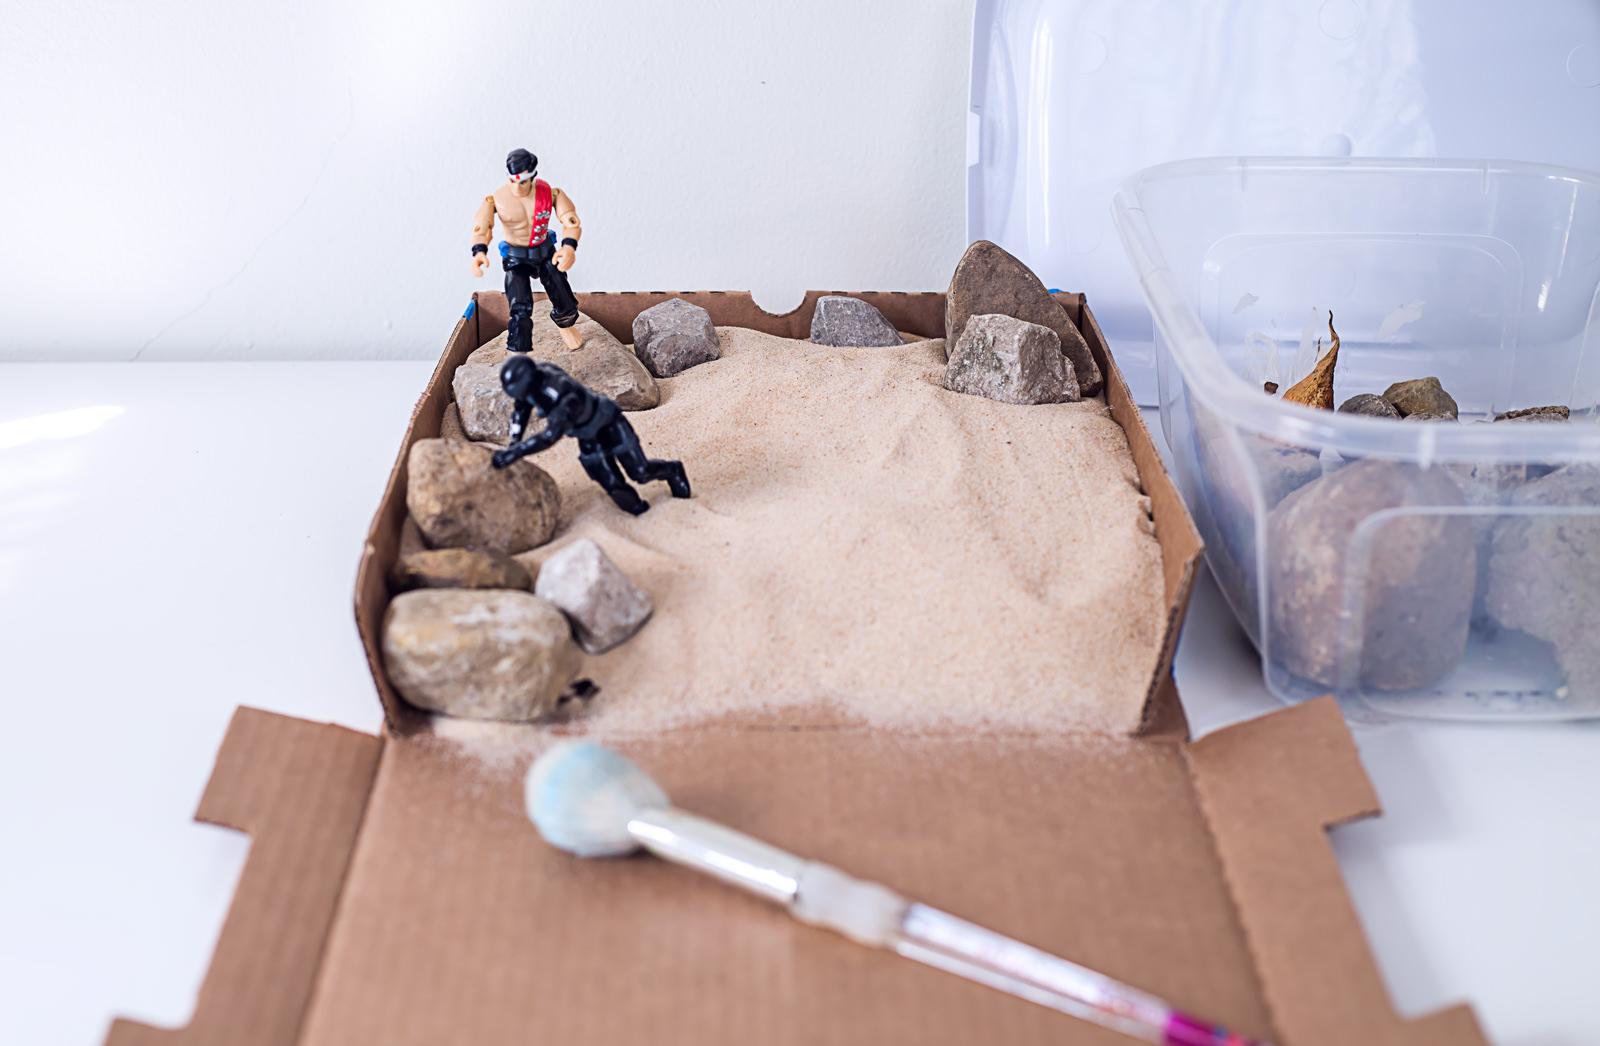 pizza-box-diorama-7.jpg